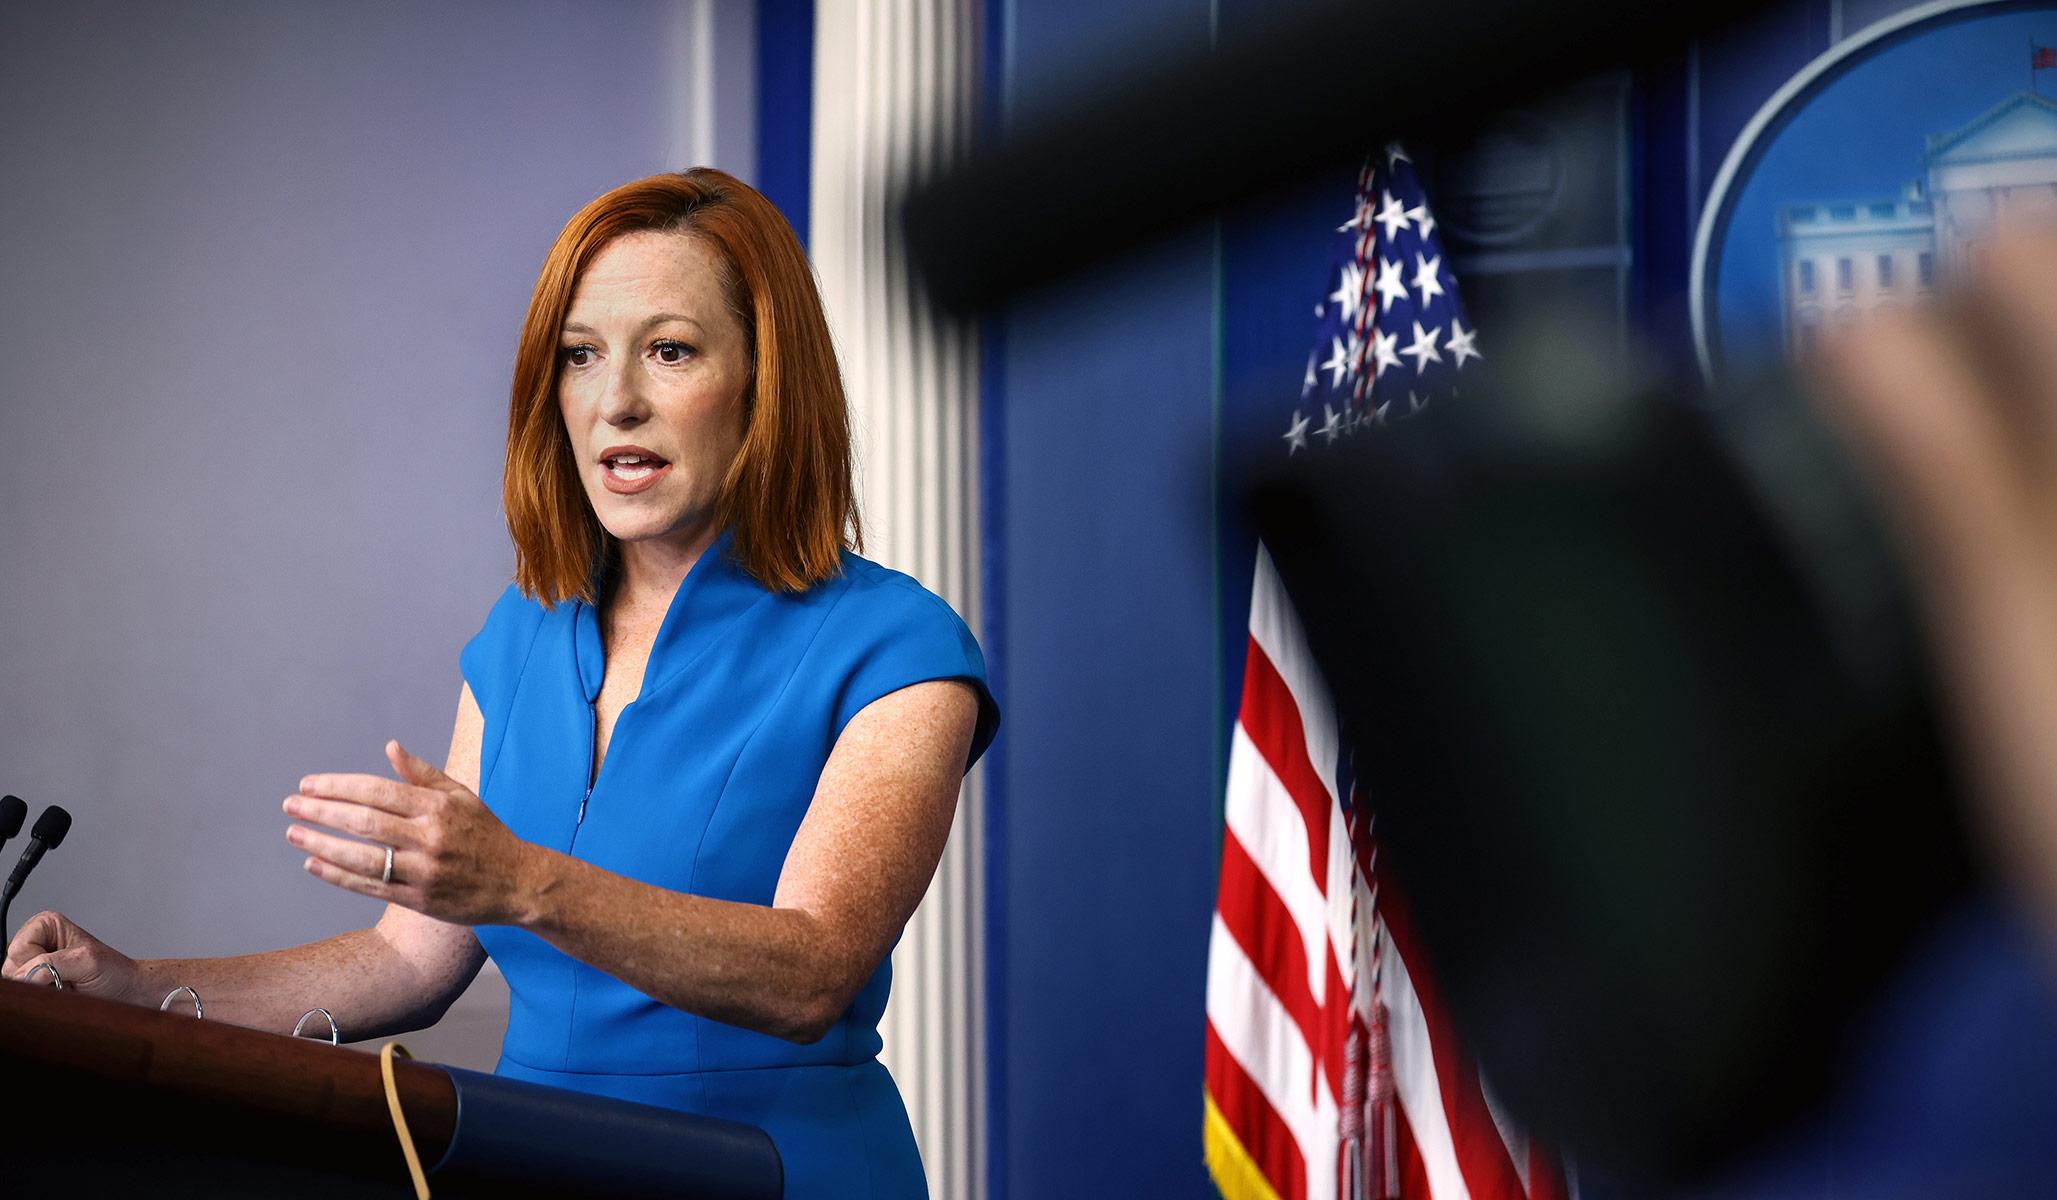 Kesepakatan Seni Hunter Biden: Kepala Etika Obama Kecam Pemecatan Kekhawatiran Psaki